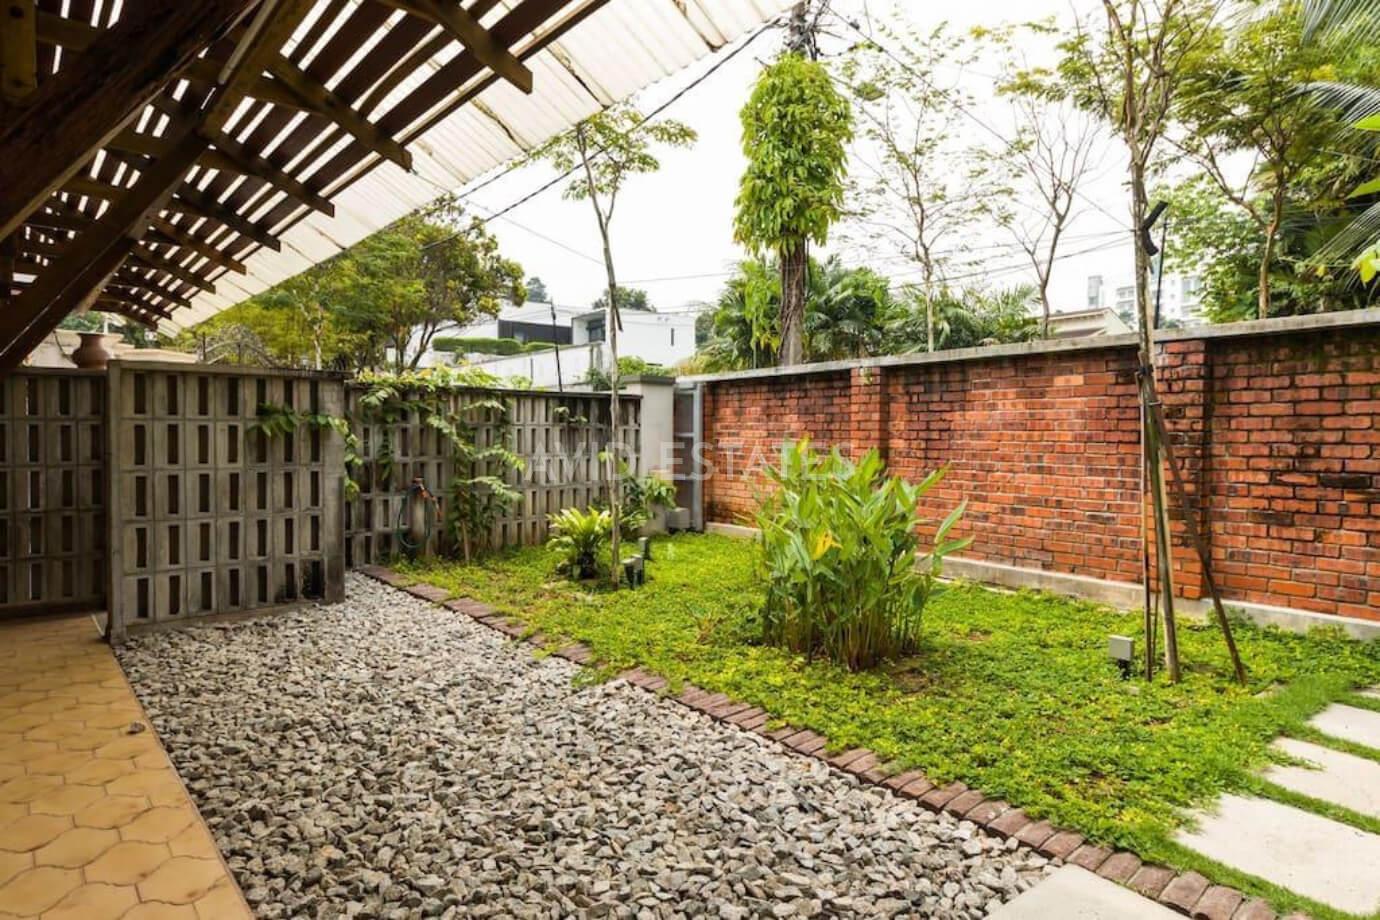 Bukit Damansara,Kuala Lumpur, 7 Bedrooms Bedrooms, ,6 BathroomsBathrooms,Bungalow / Detached,For Sale,Bukit Damansara,Derumun,2169